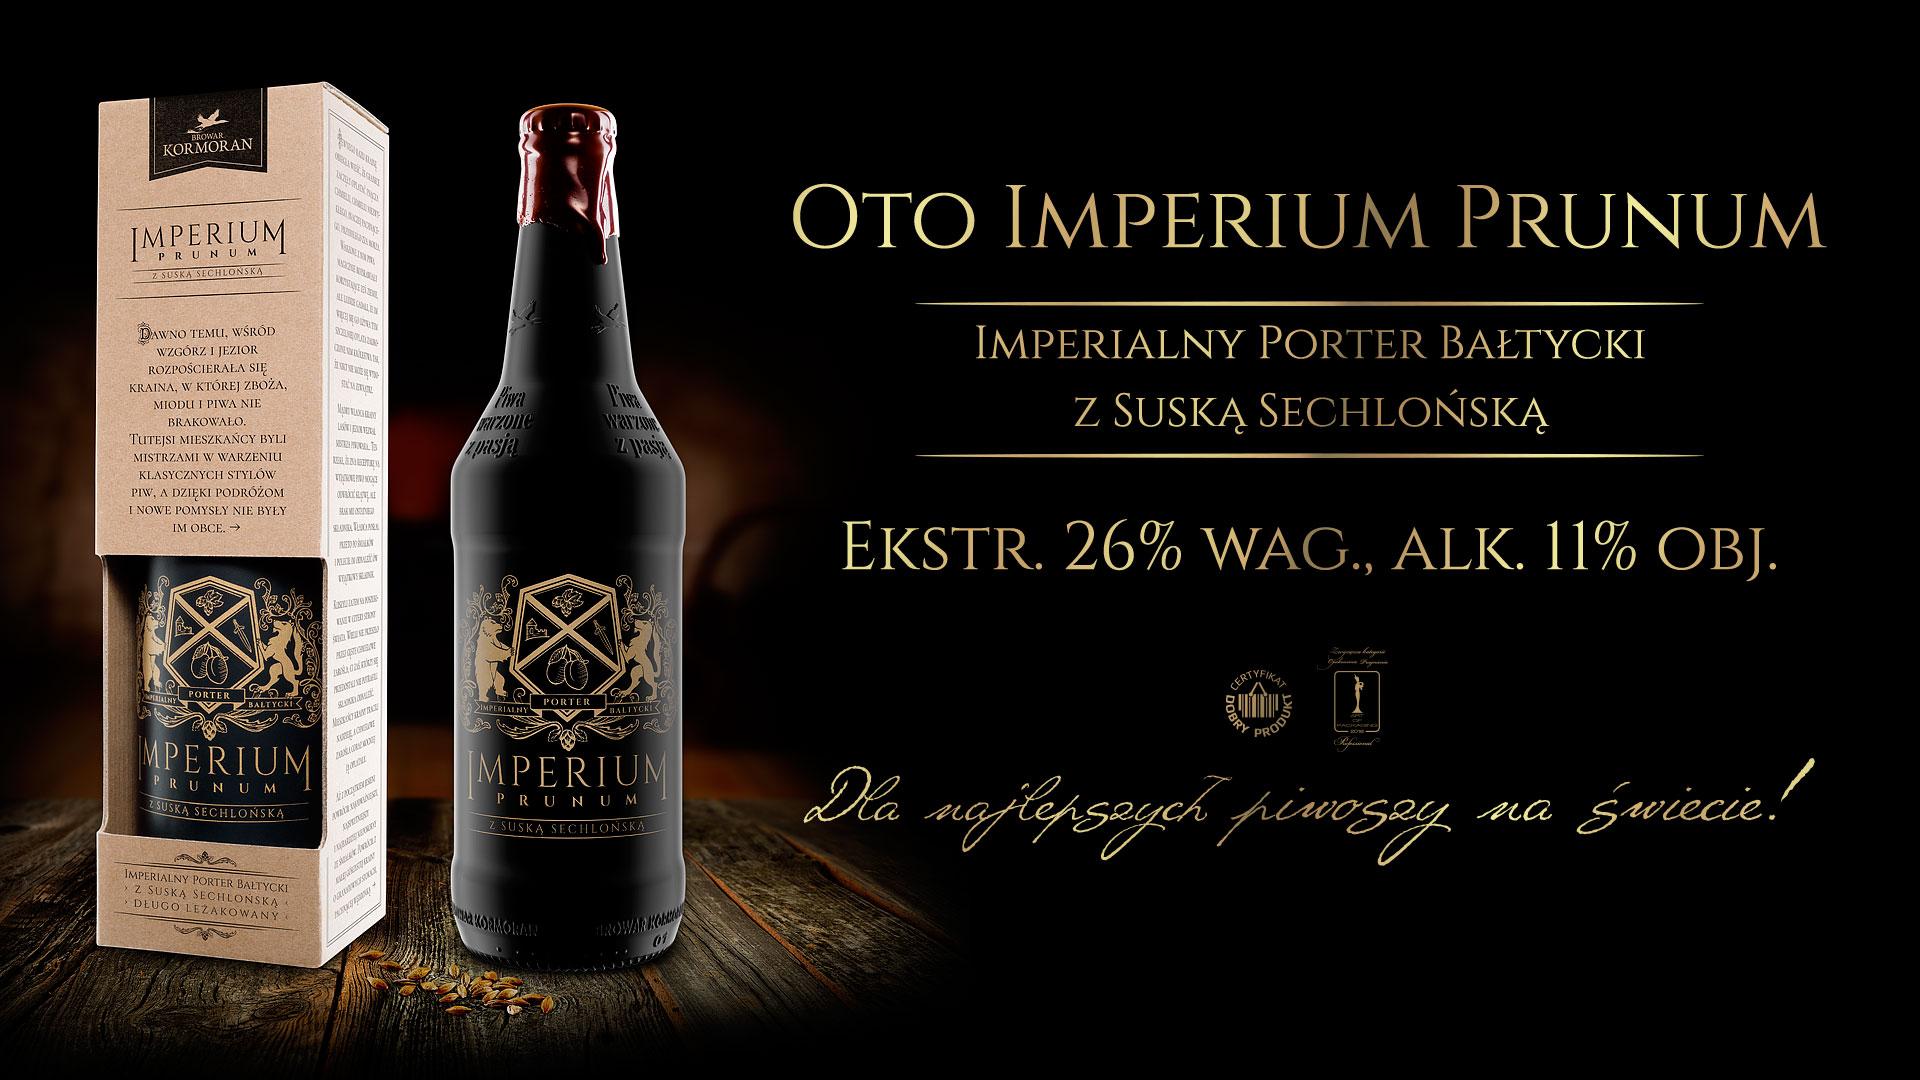 Piwo Imperium Prunum - Browar Kormoran